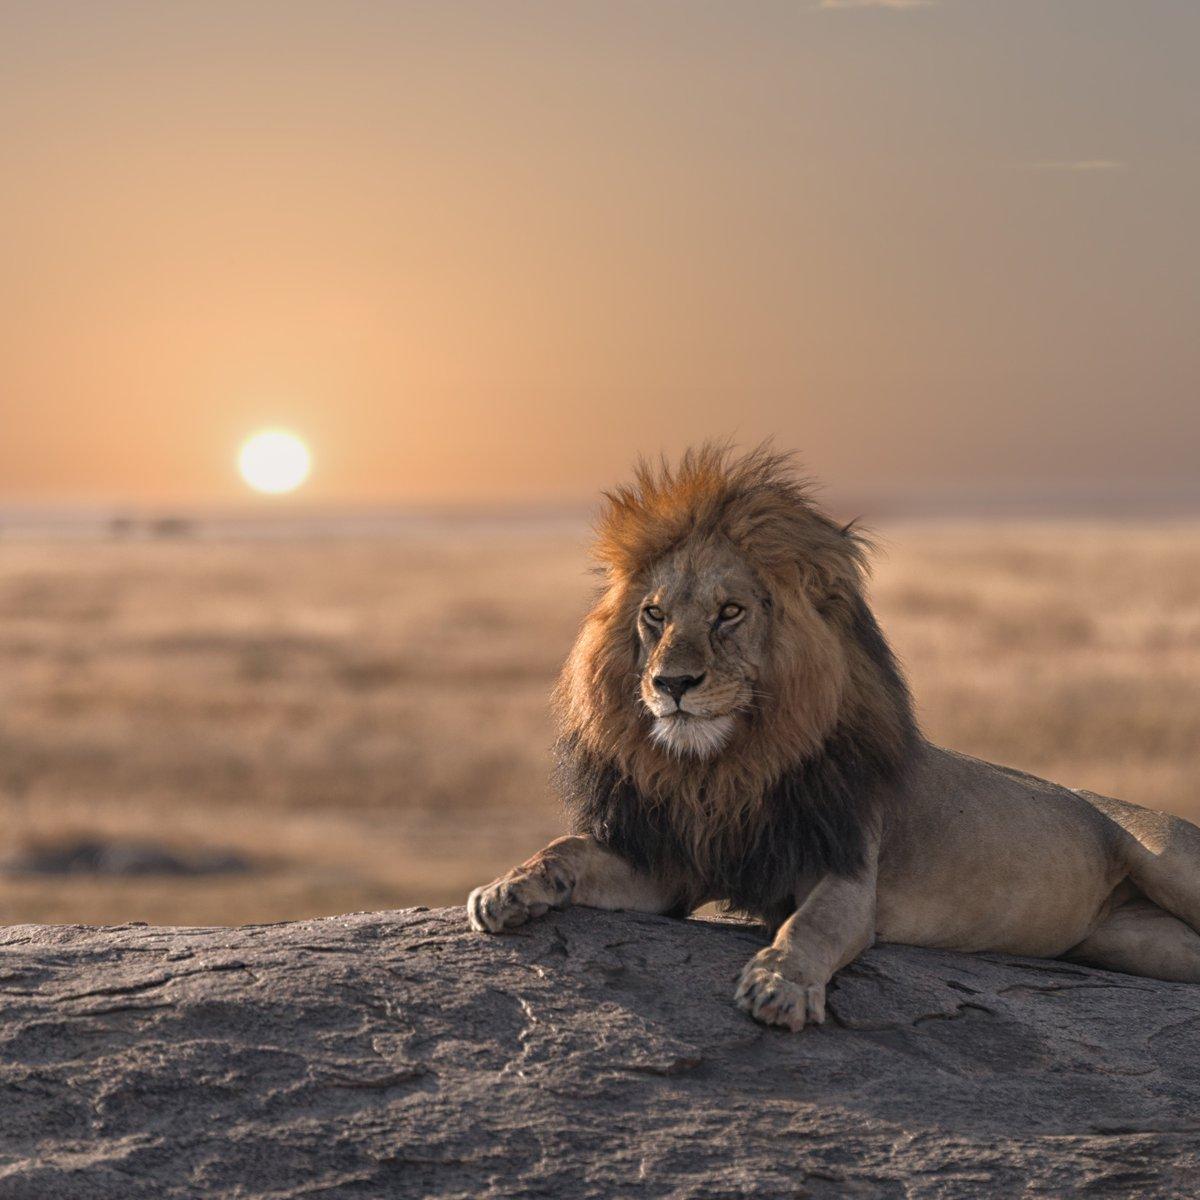 King of the Serengeti… https://t.co/Idml6LUIz0